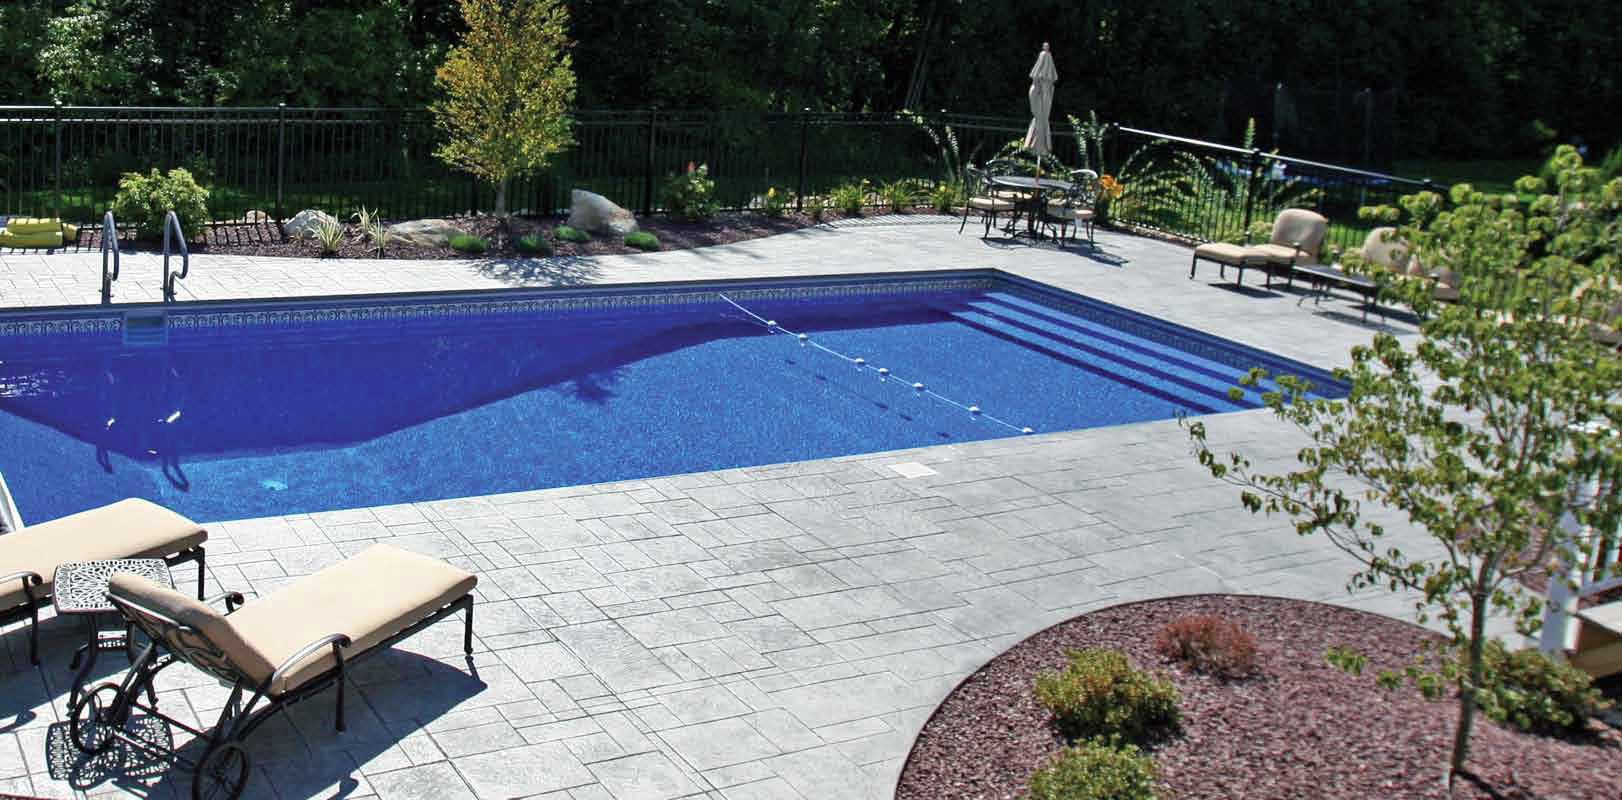 , Vinyl Finish Over Steps, Savings Pools – Ohio Swimming Pool Installation & Repairs